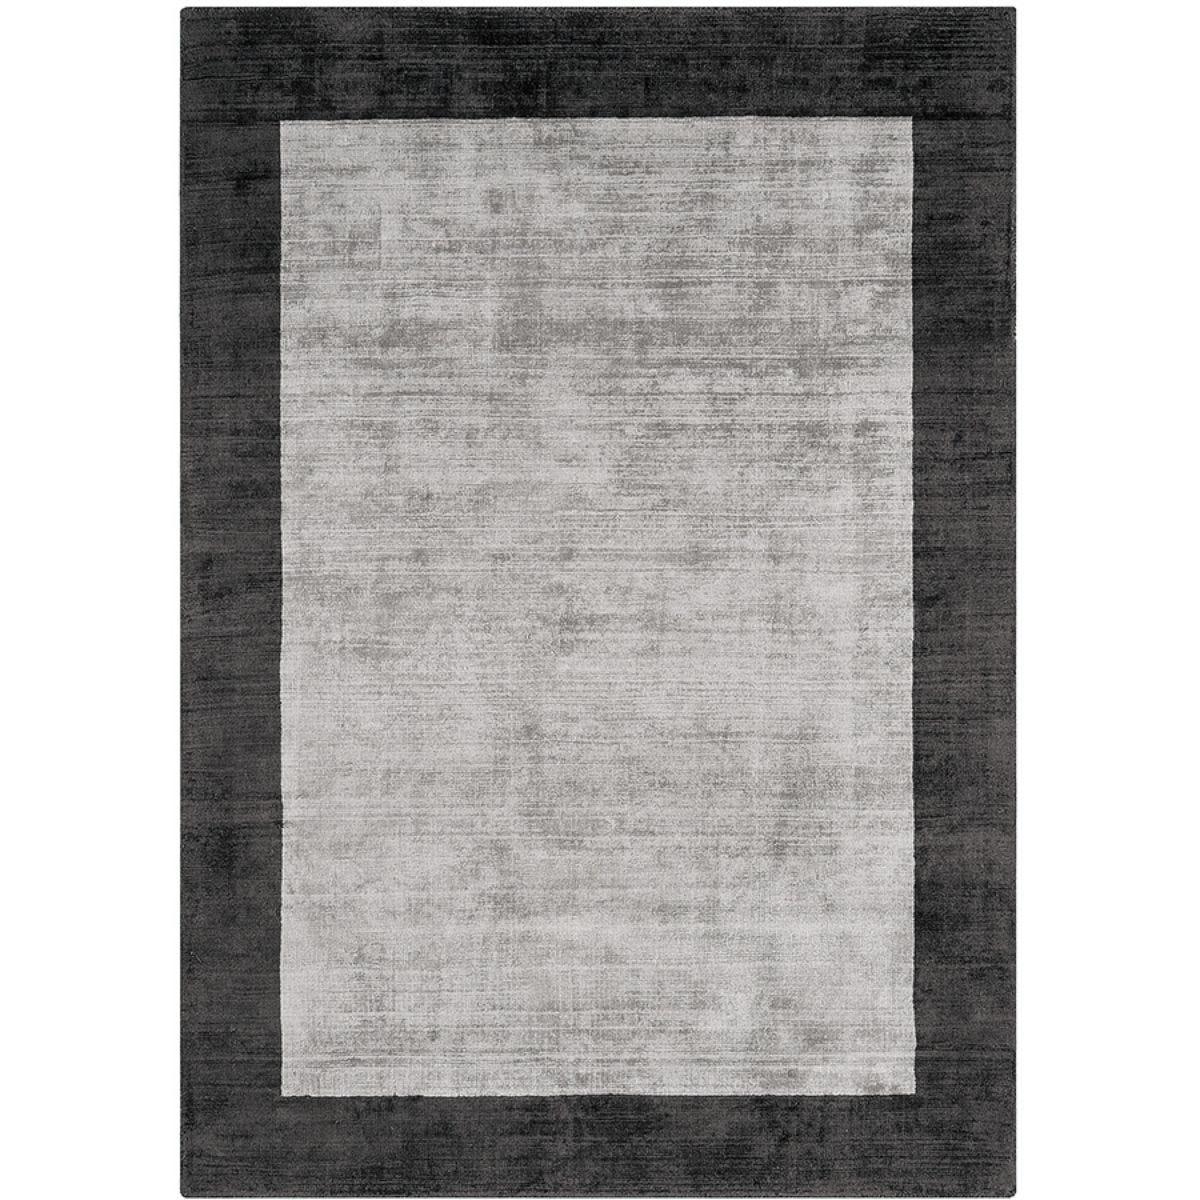 Asiatic Border Rug, 200 x 290cm - Silver